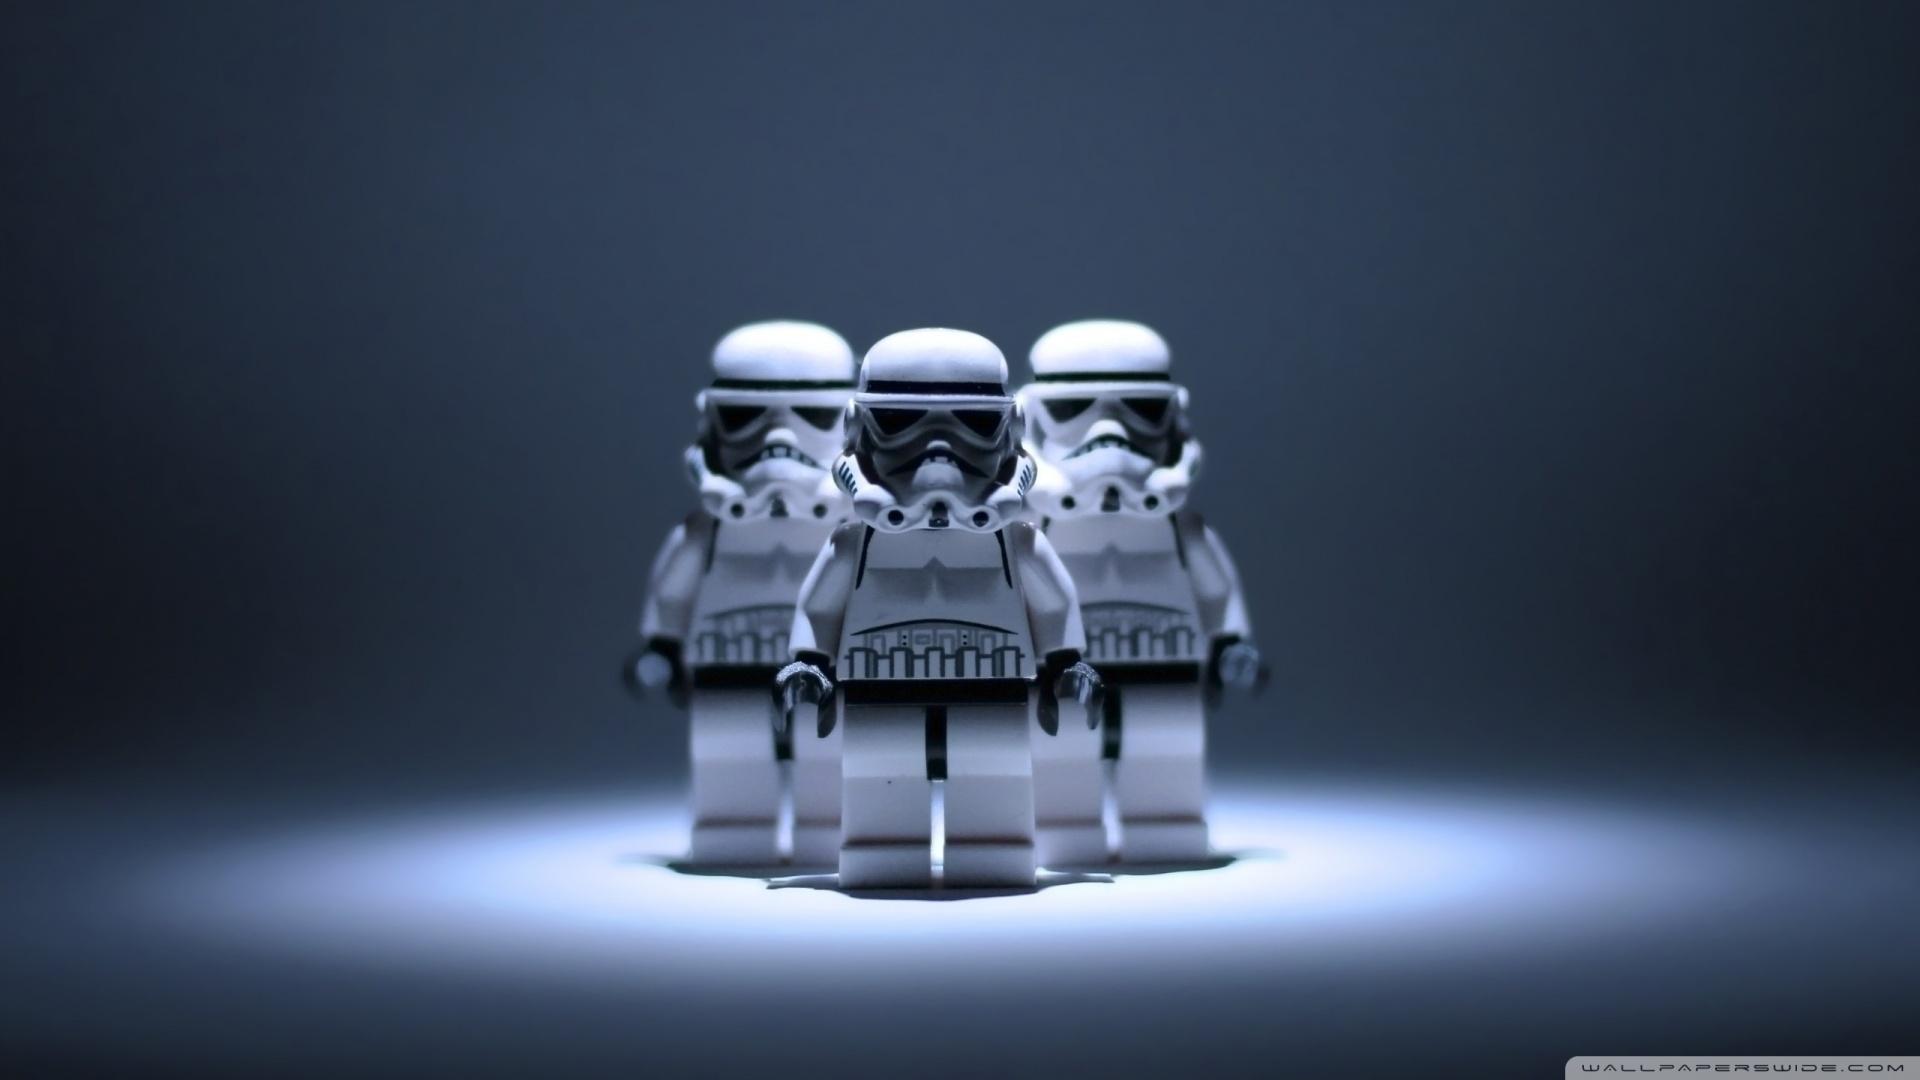 Lego Stormtrooper Wallpaper 1920x1080 Star Wars Lego Stormtrooper 1920x1080